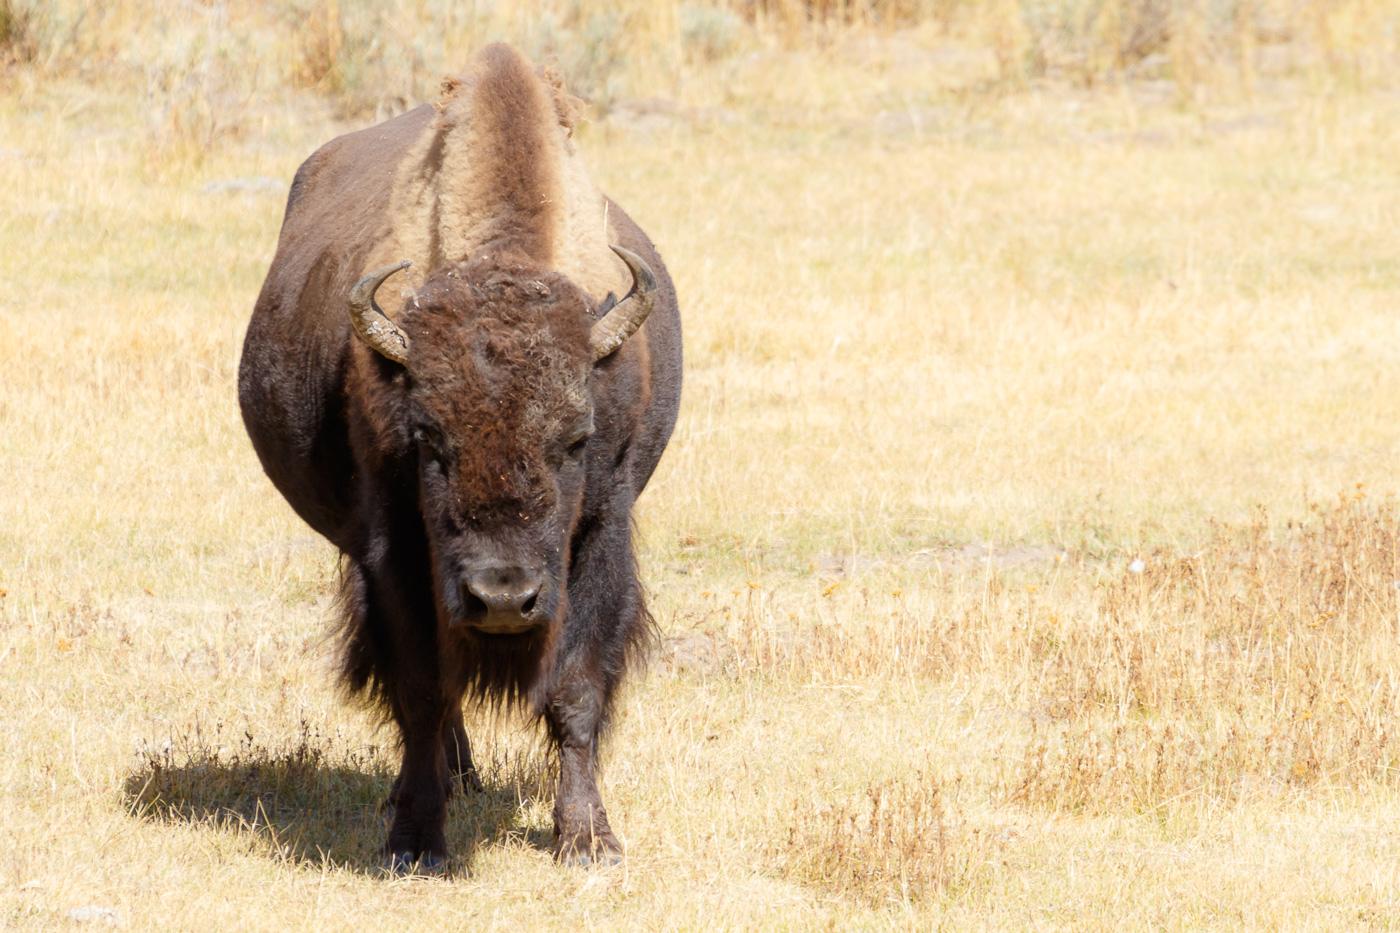 Bison (Bison bison), Yellowstone National Park, U.S.A. - Fauna de Nord-Amèrica - Raül Carmona - Fotografia, Fotografia d'estudi, esdeveniments i Natura